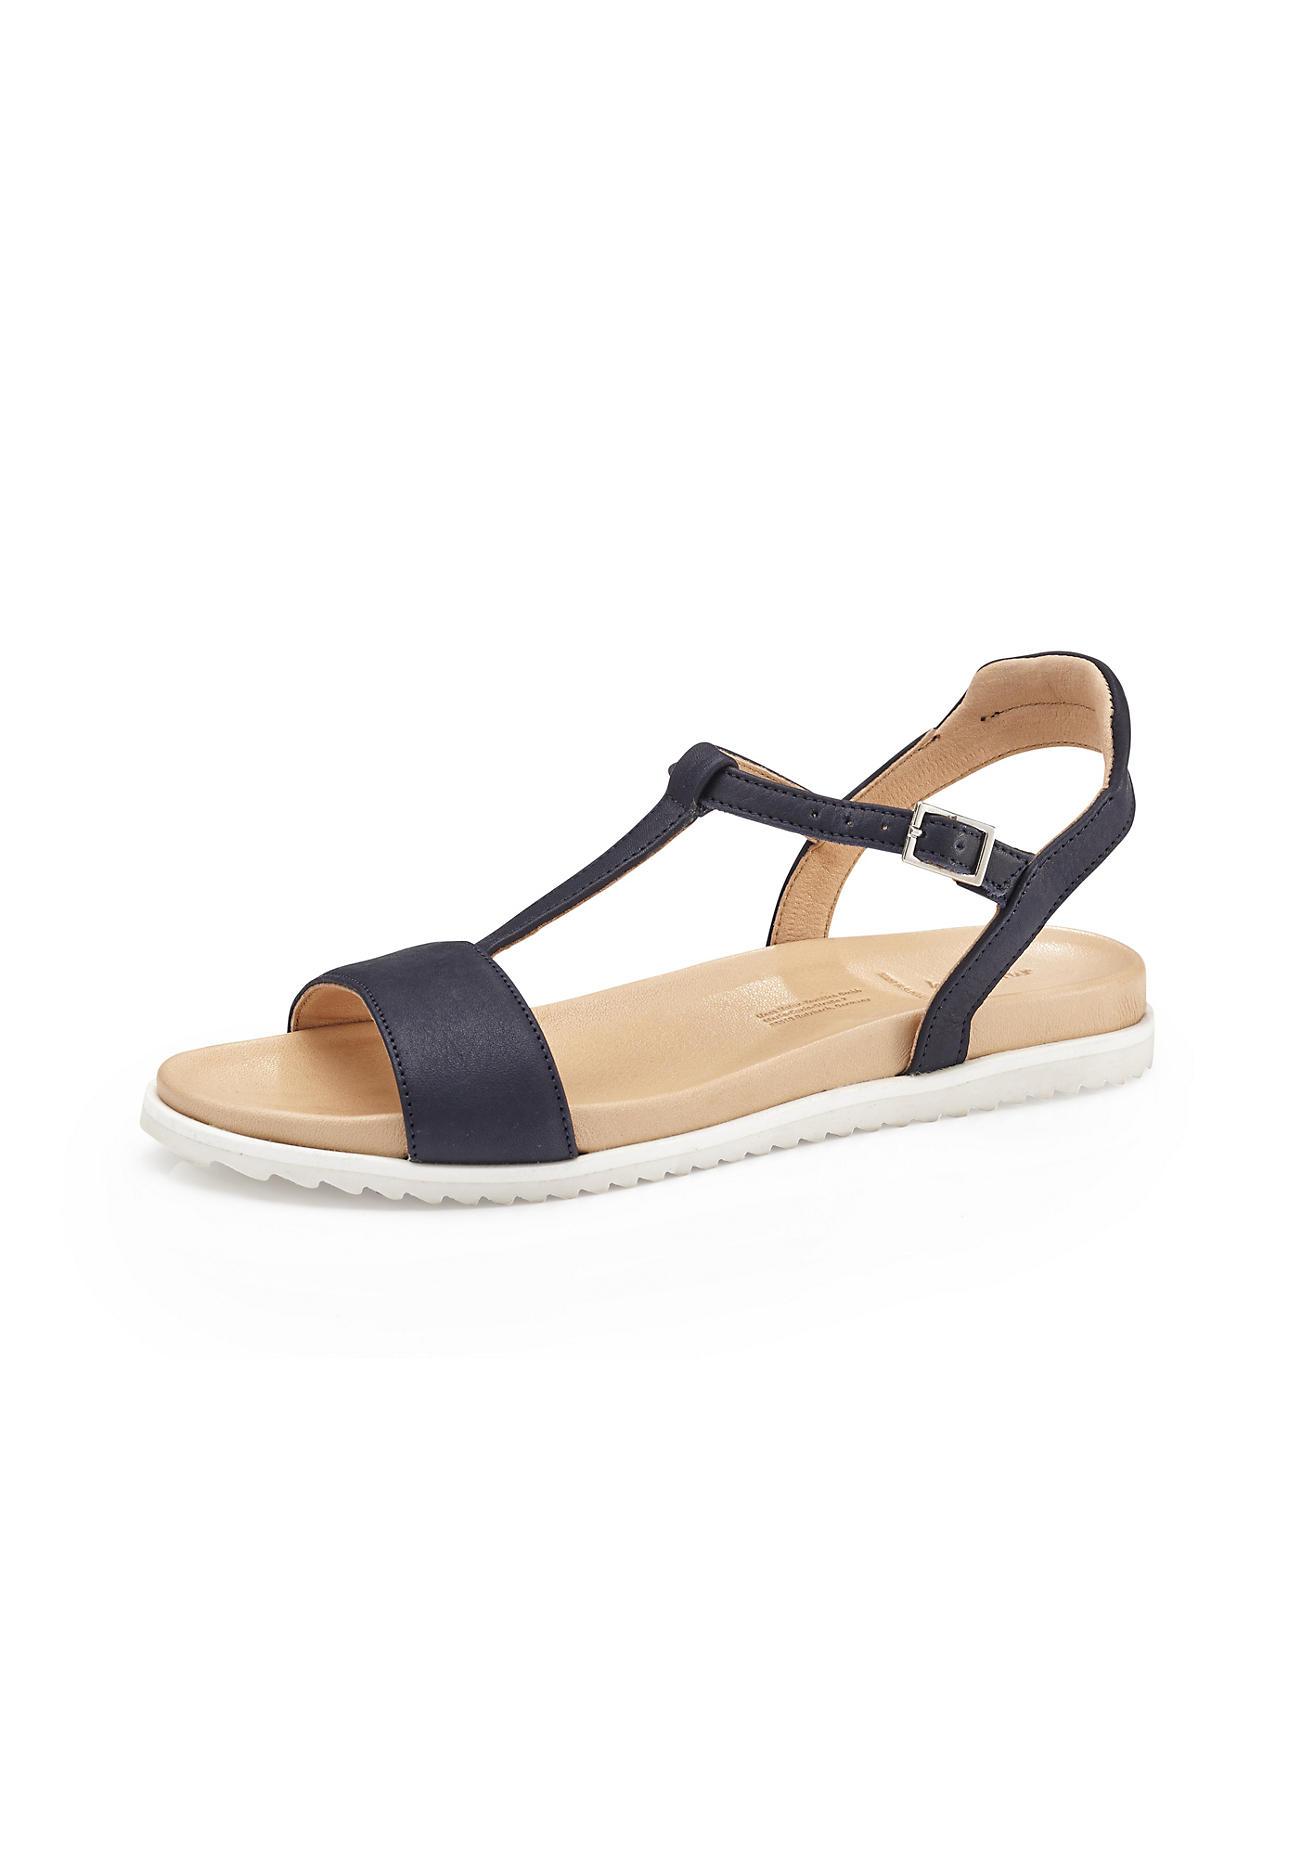 hessnatur Damen Damen Sandale aus Leder – blau – Größe 41